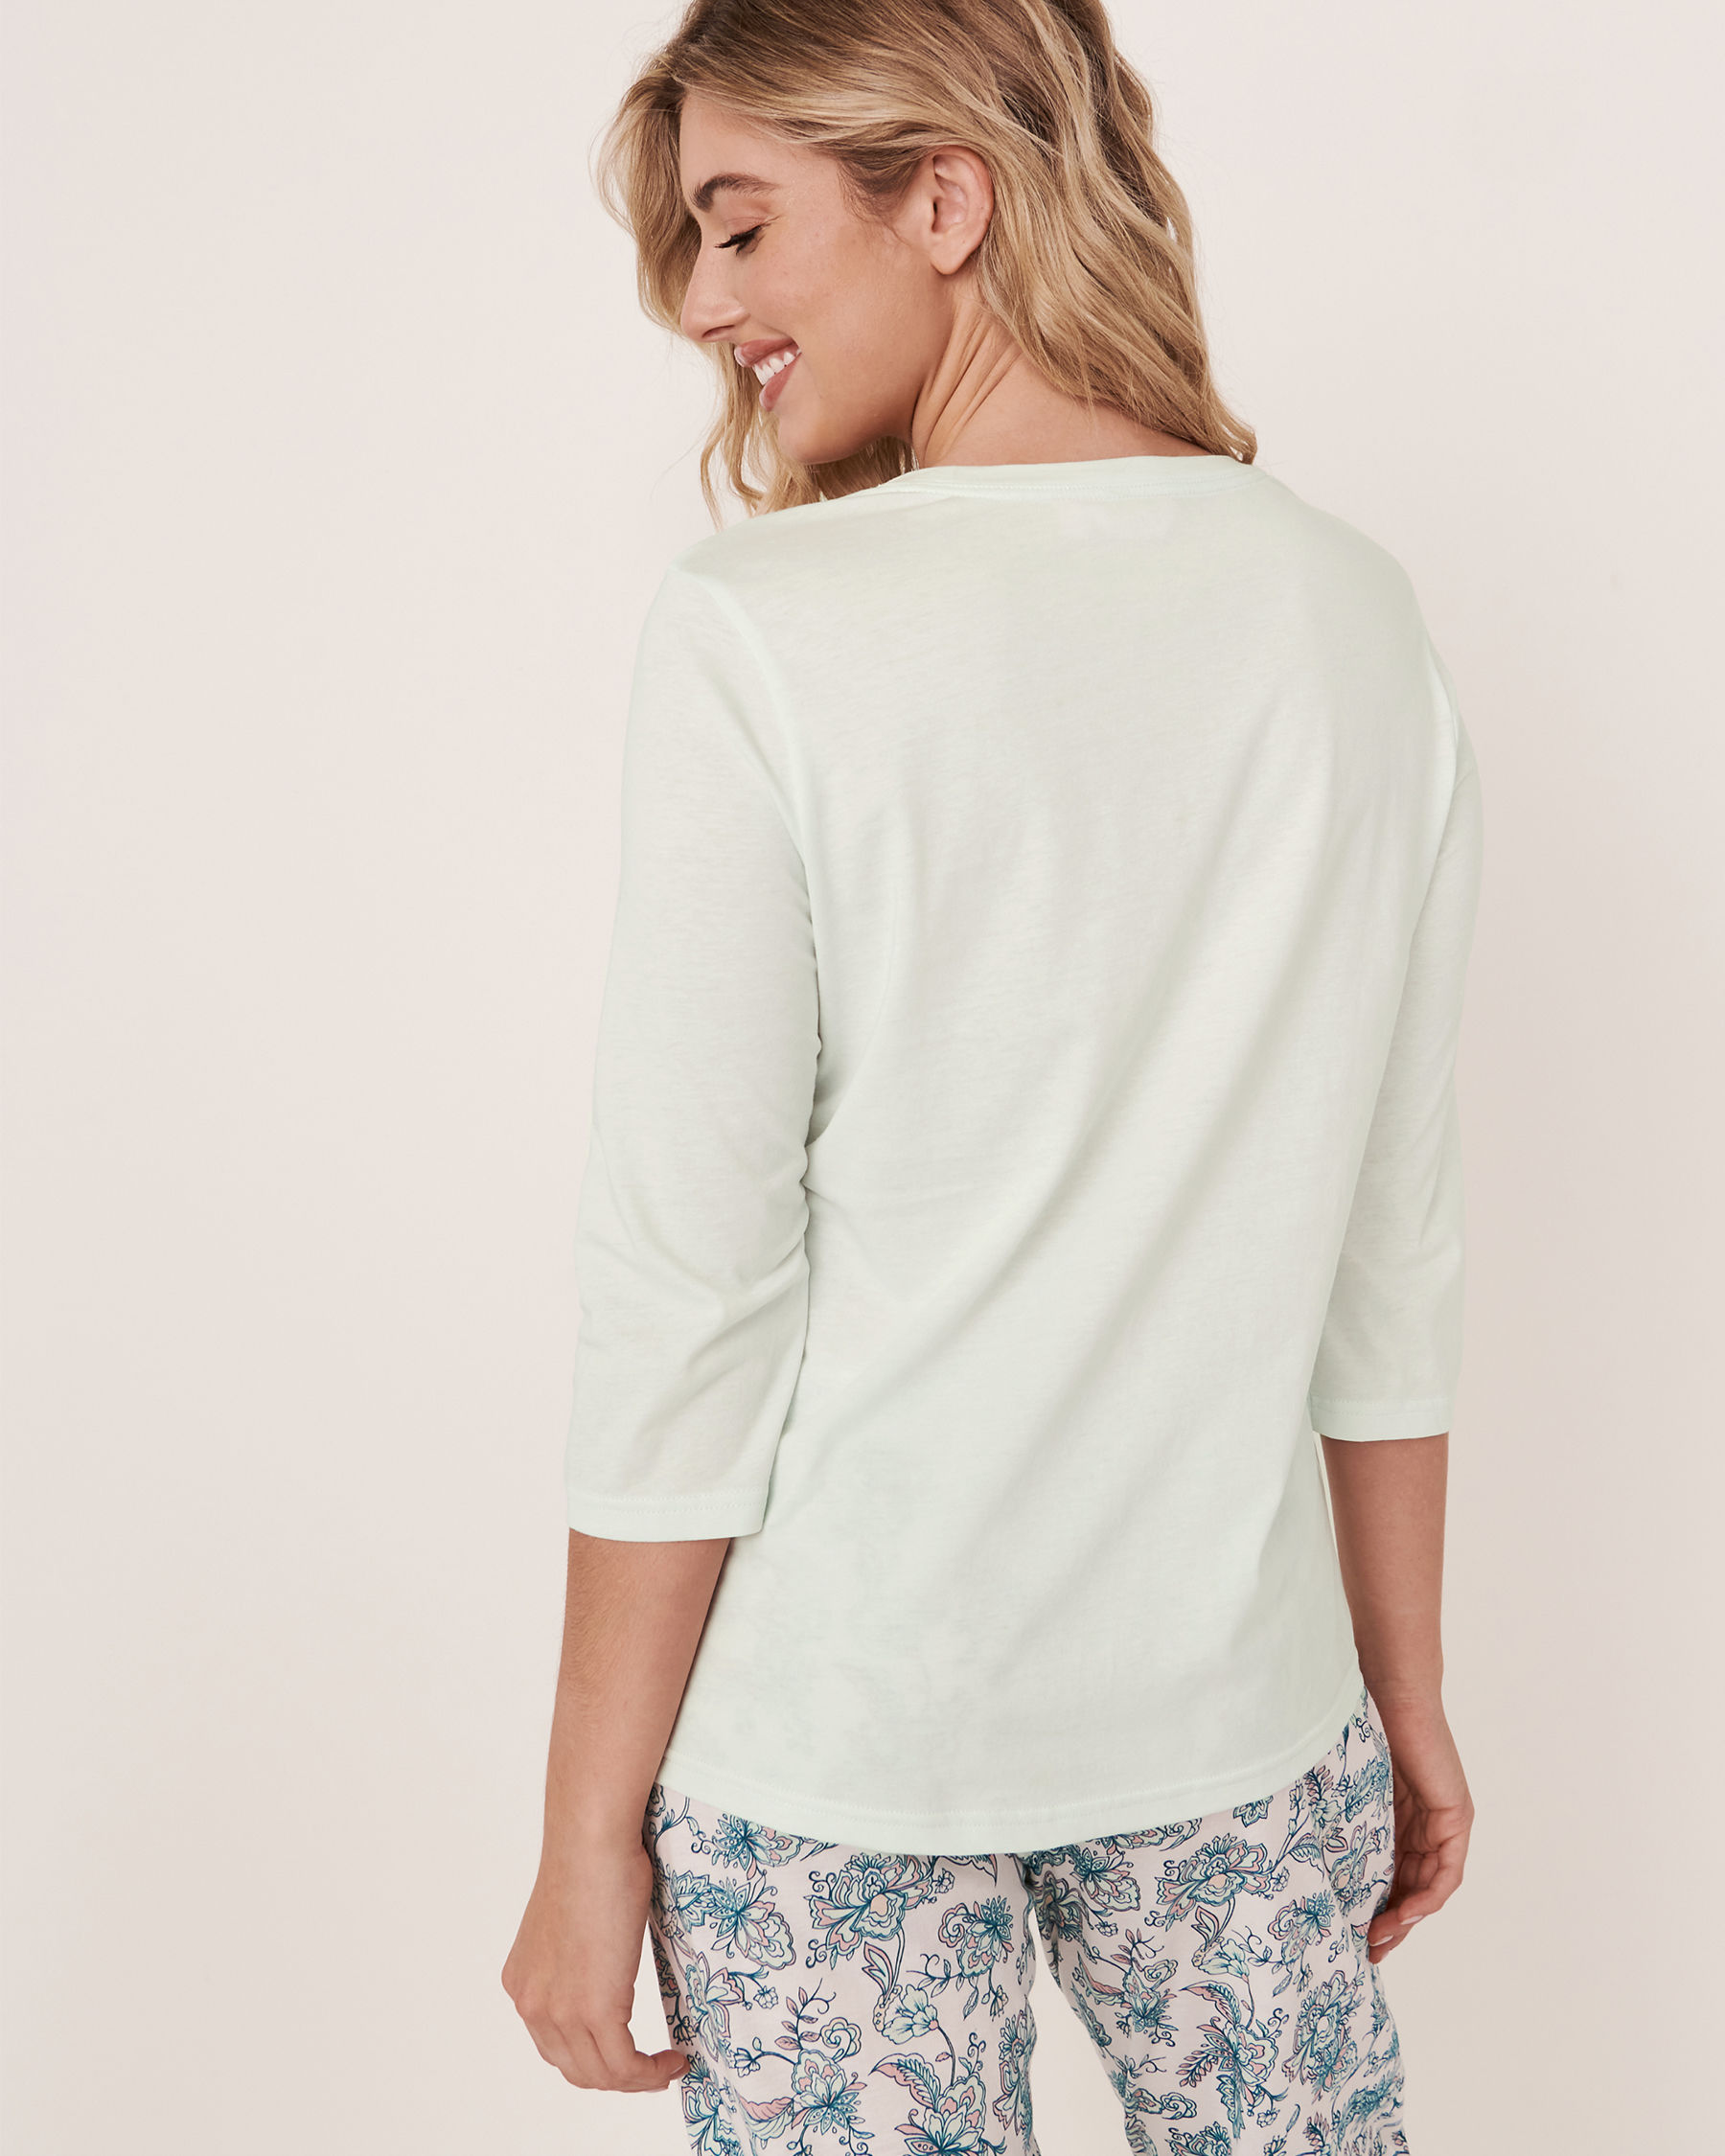 LA VIE EN ROSE V-neckline 3/4 Sleeve Shirt Light aqua 40100179 - View2